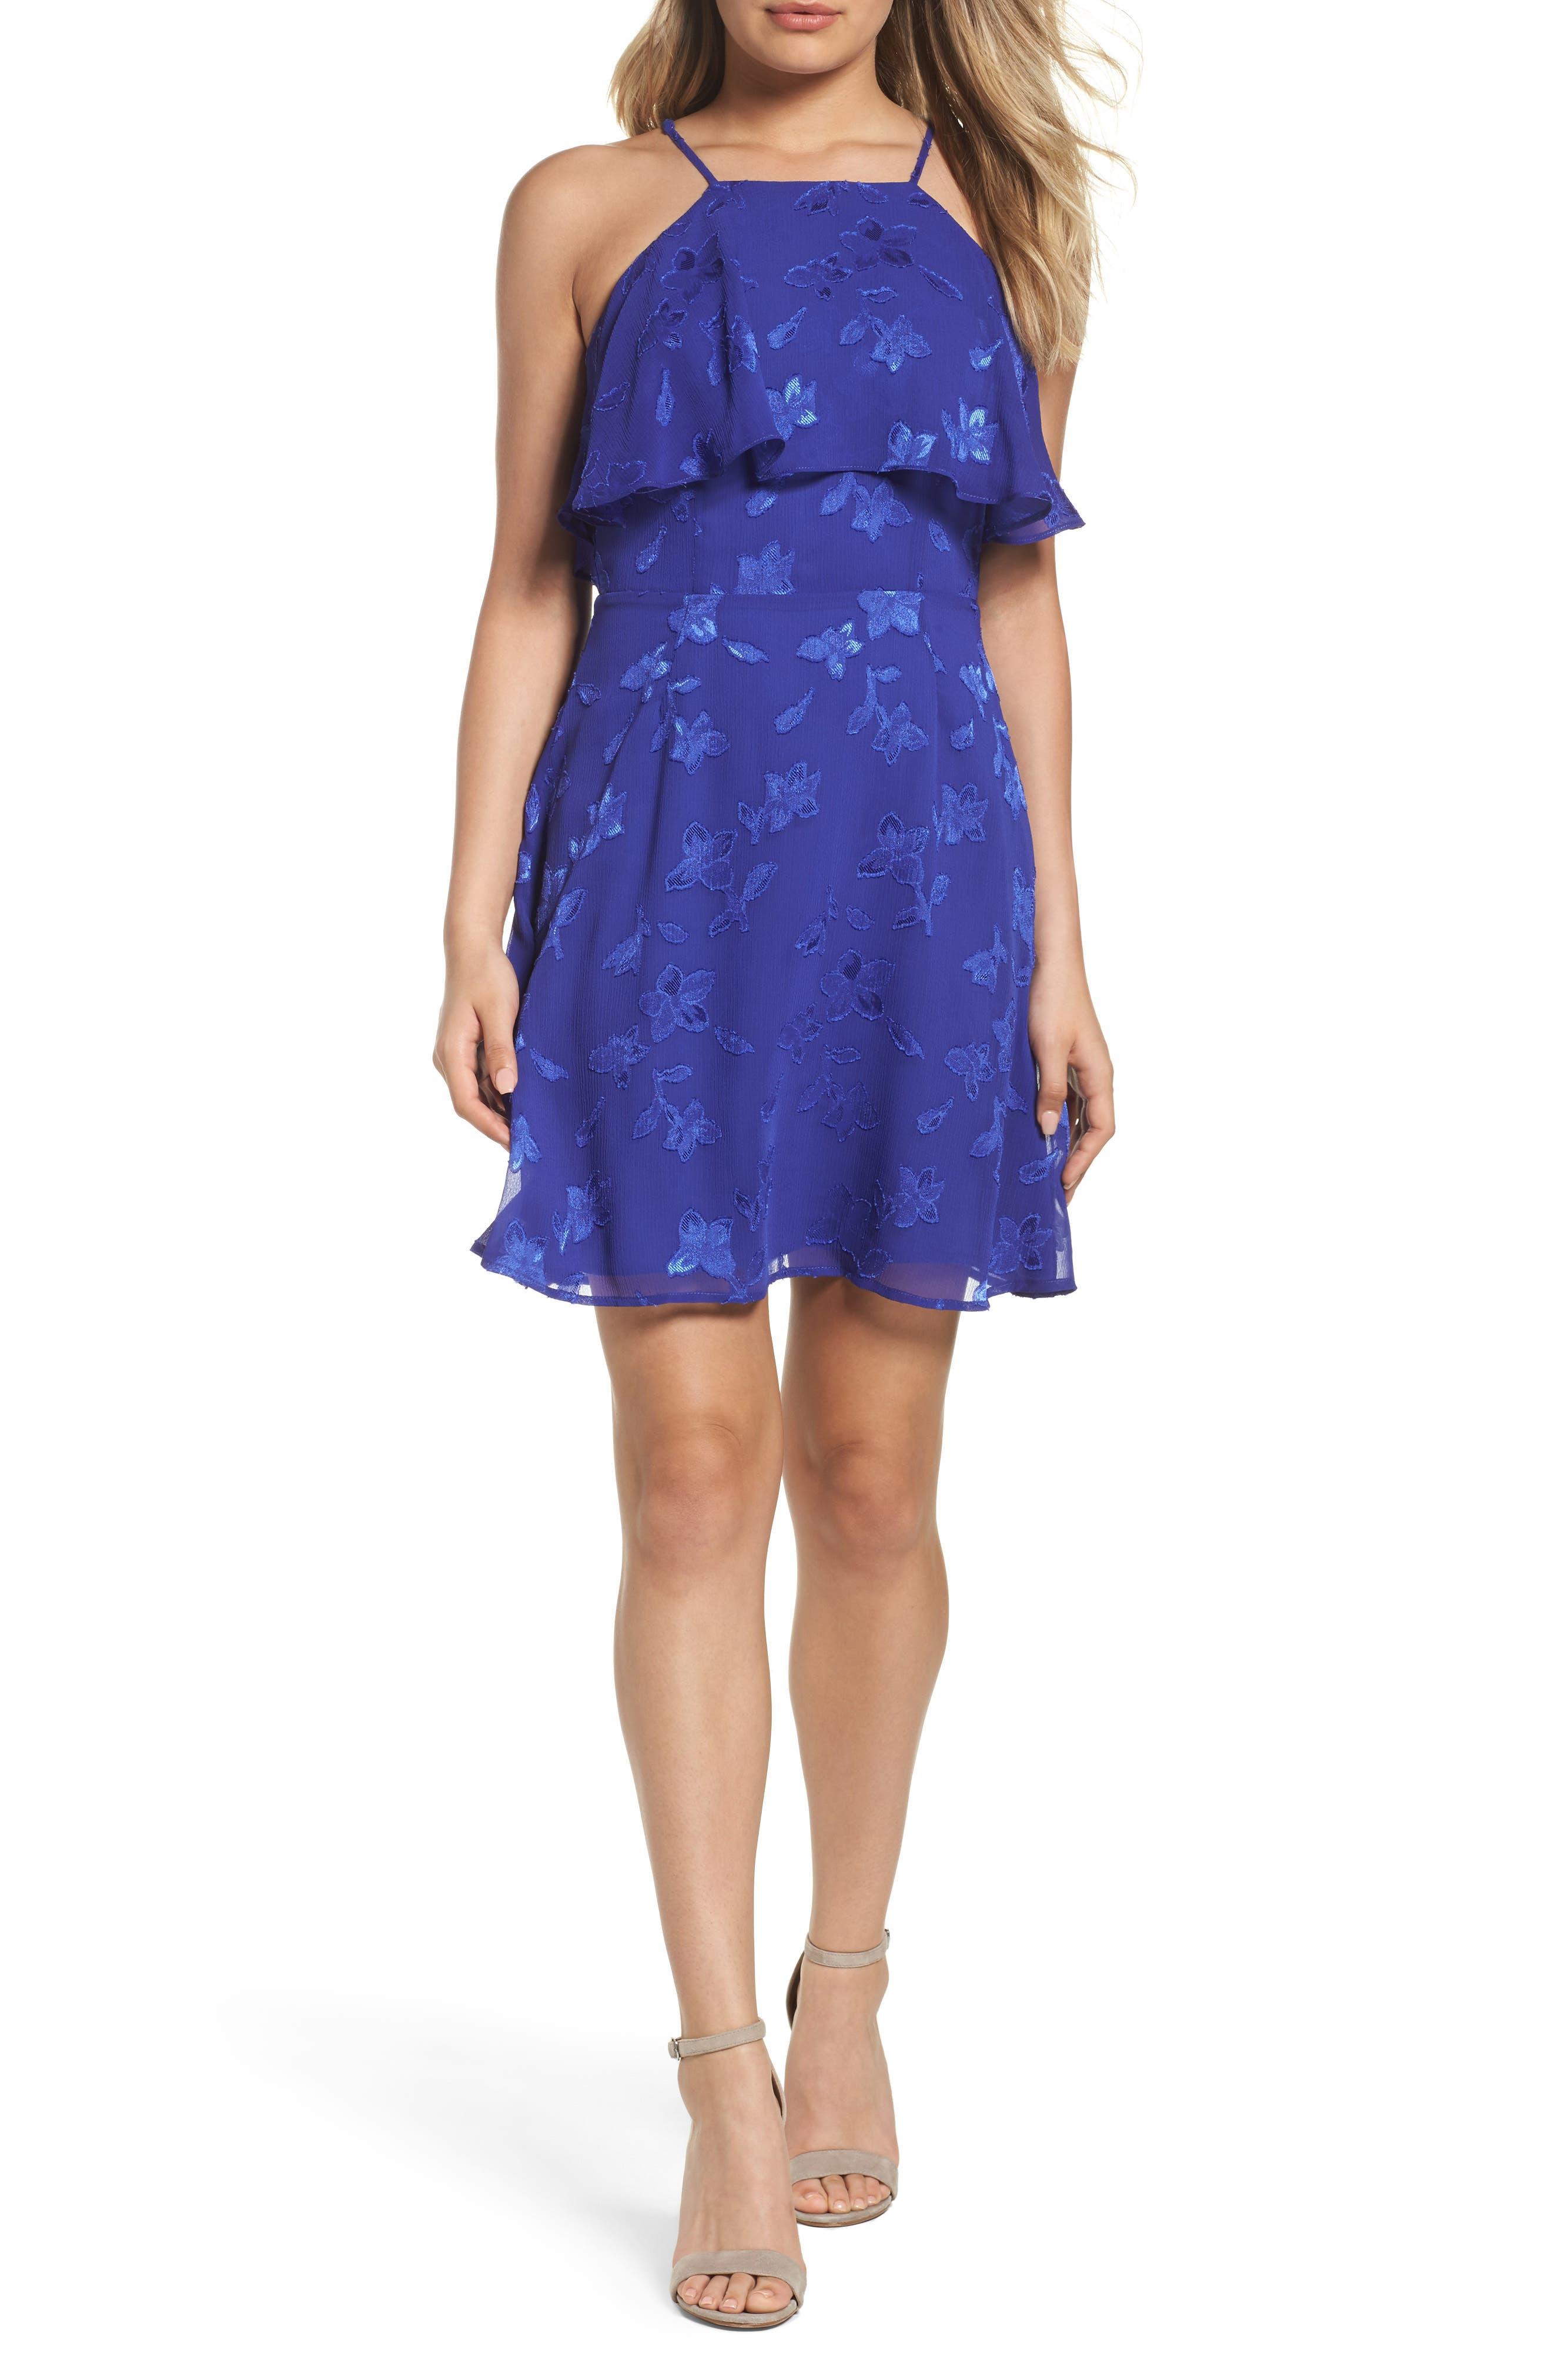 Main Image - 19 Cooper Jacquard Flower Popover Dress